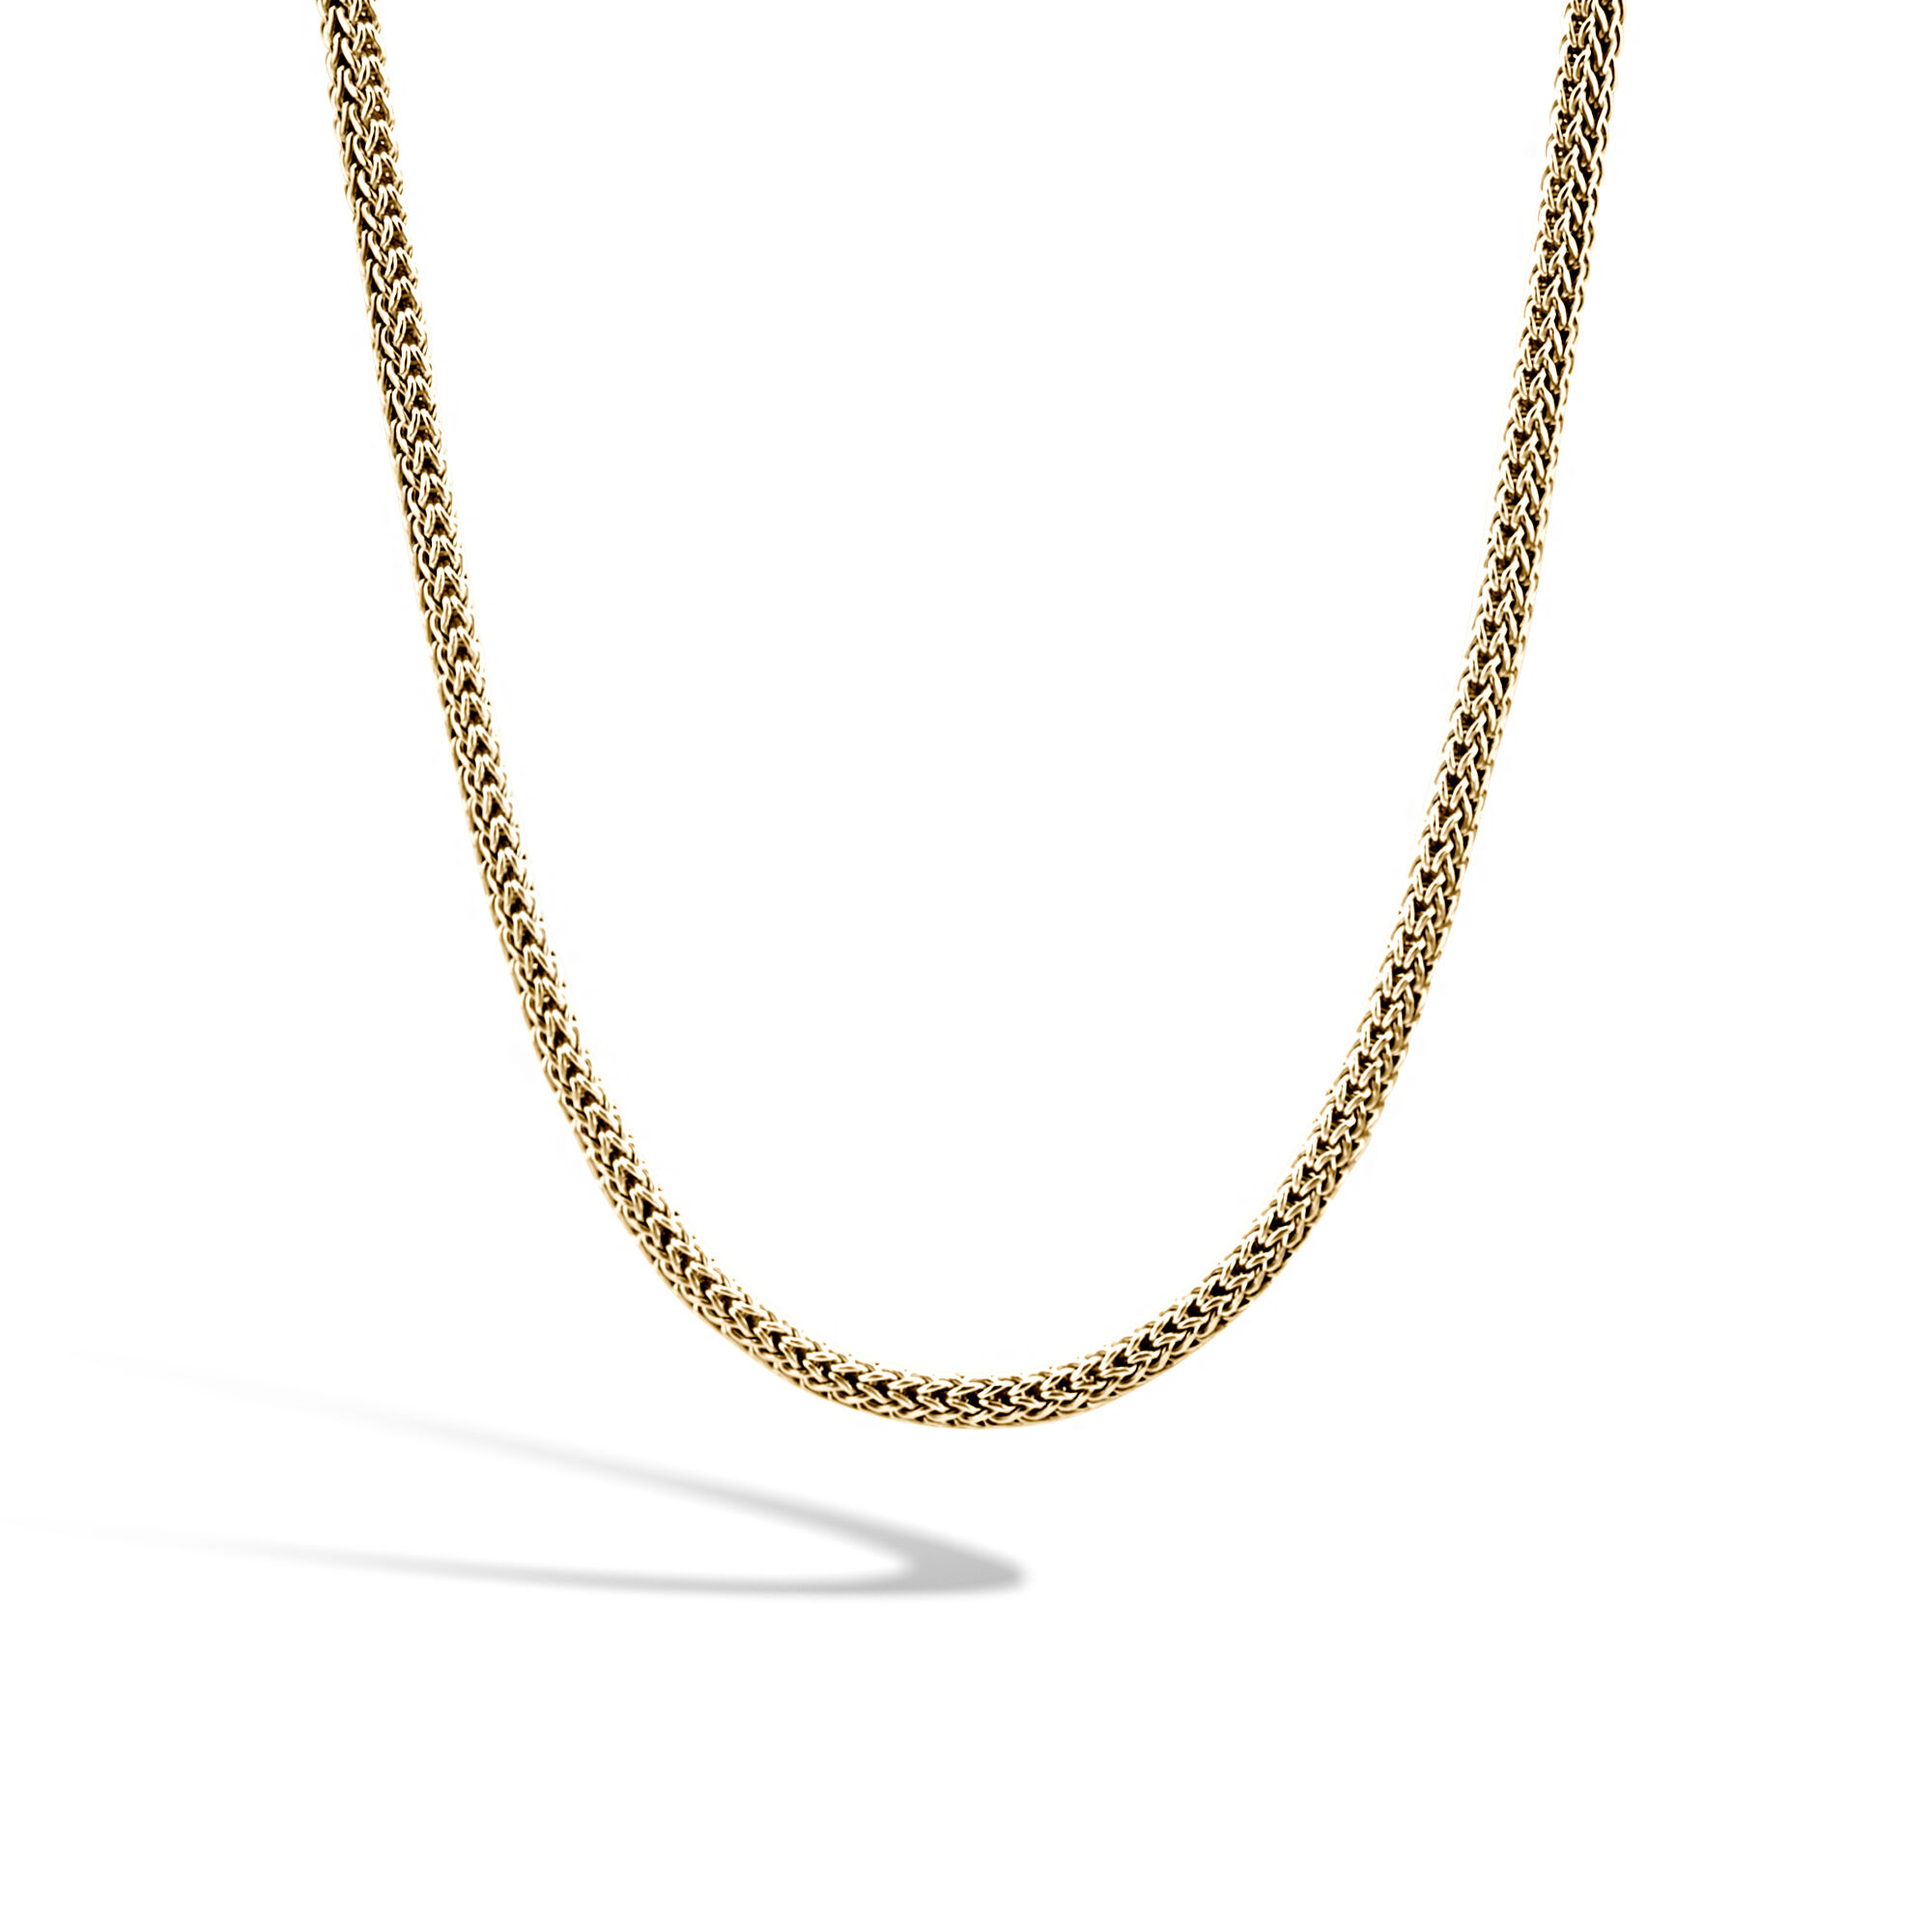 John Hardy Classic Chain Necklace Gsyk6sxp